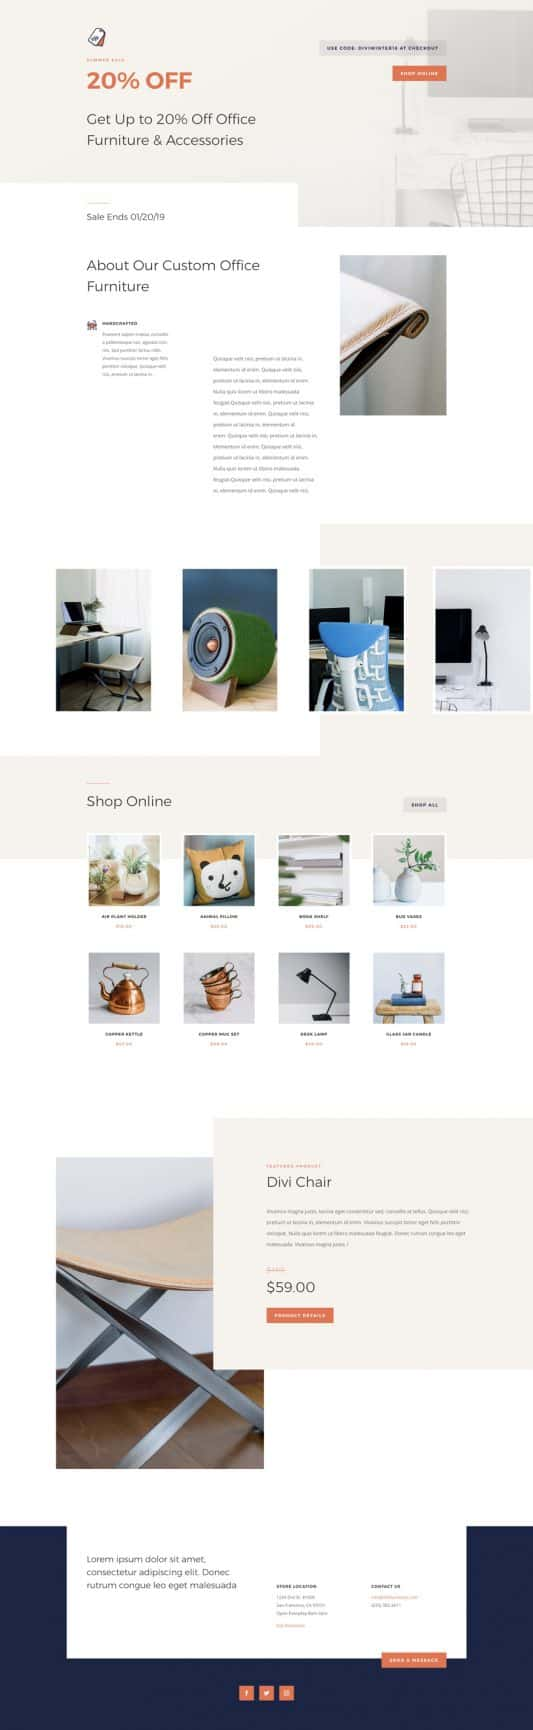 Furniture Store Web Design 7